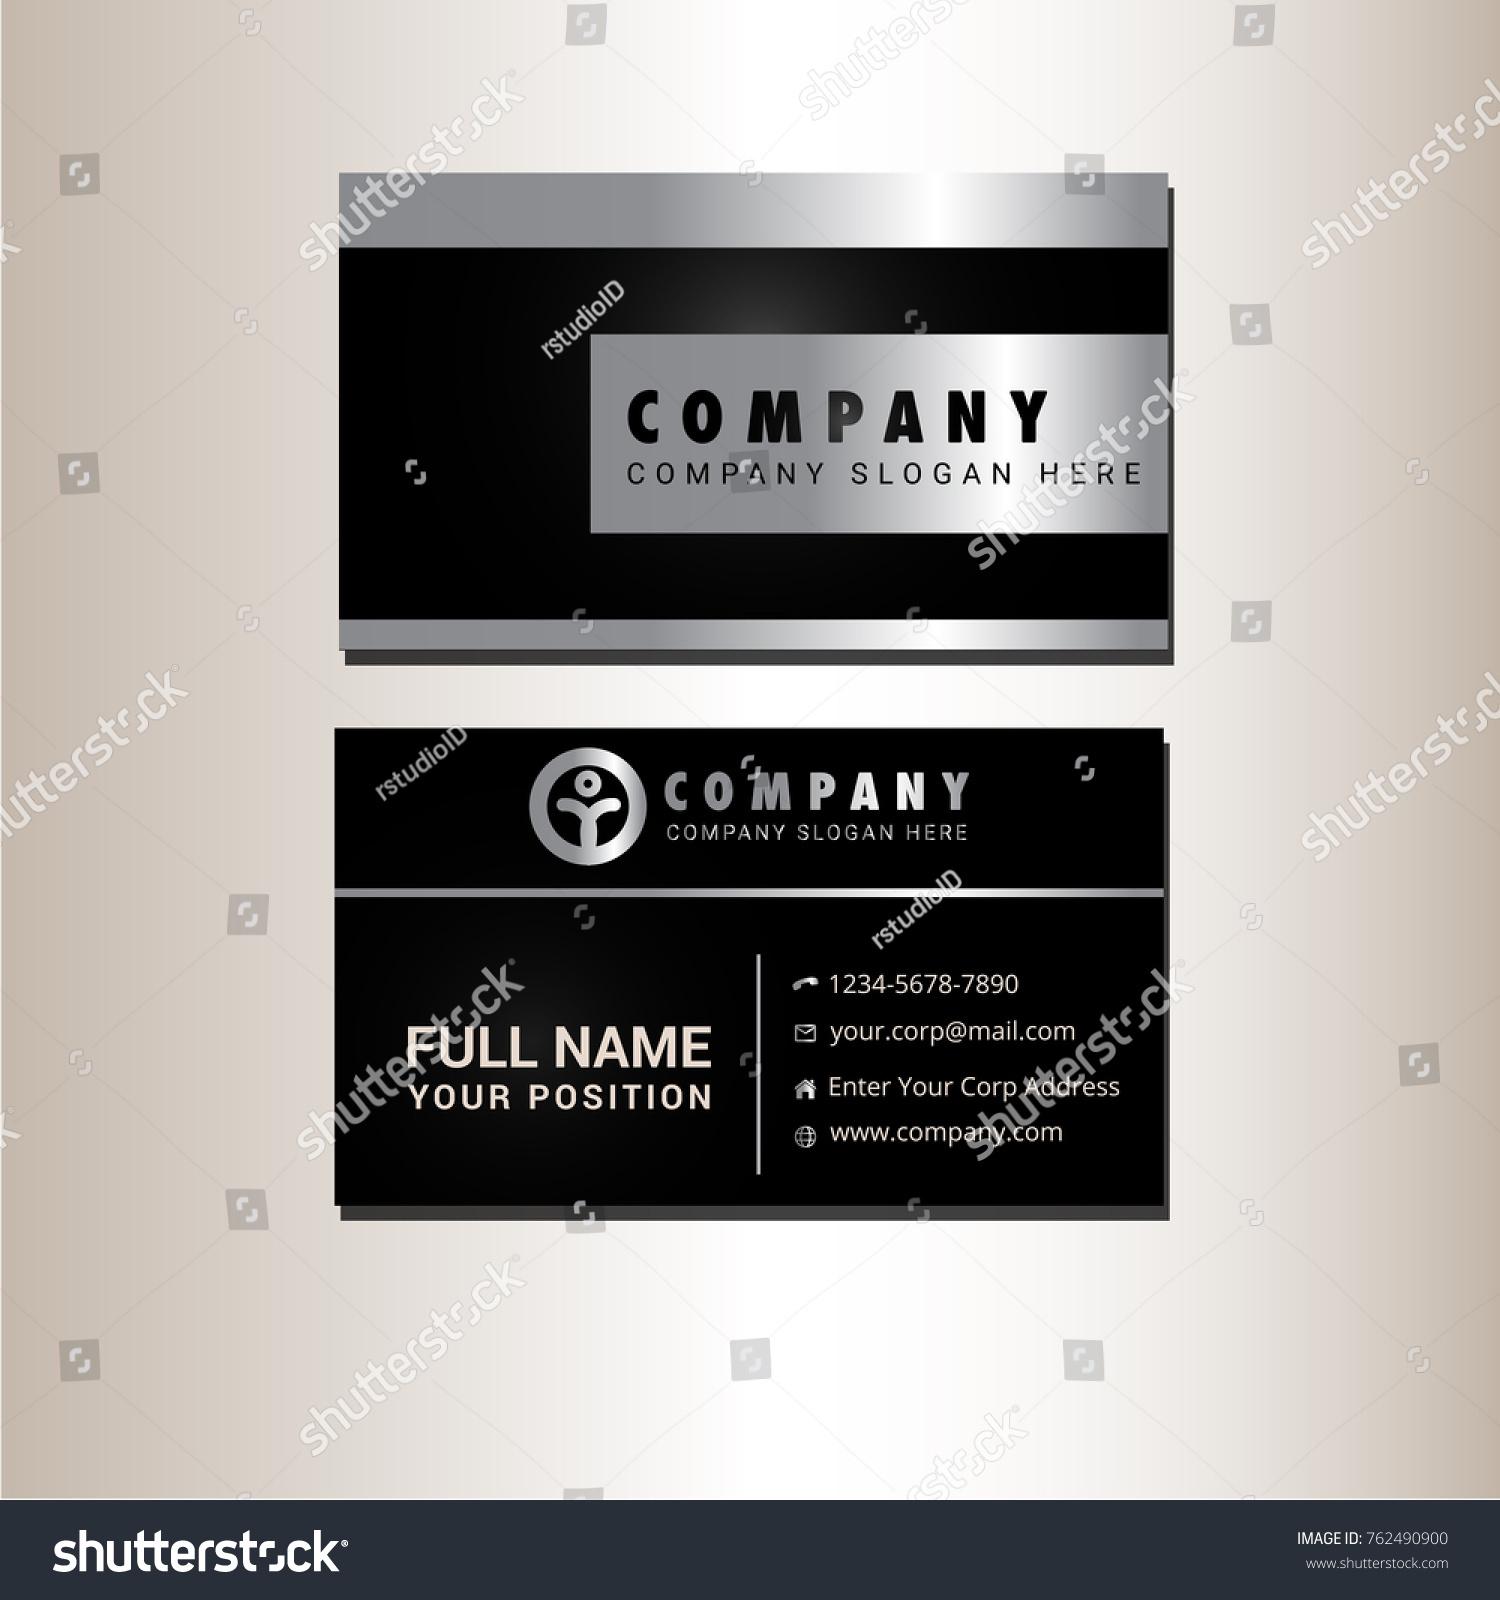 Black Silver Business Card Vector Stock Vector 762490900 - Shutterstock